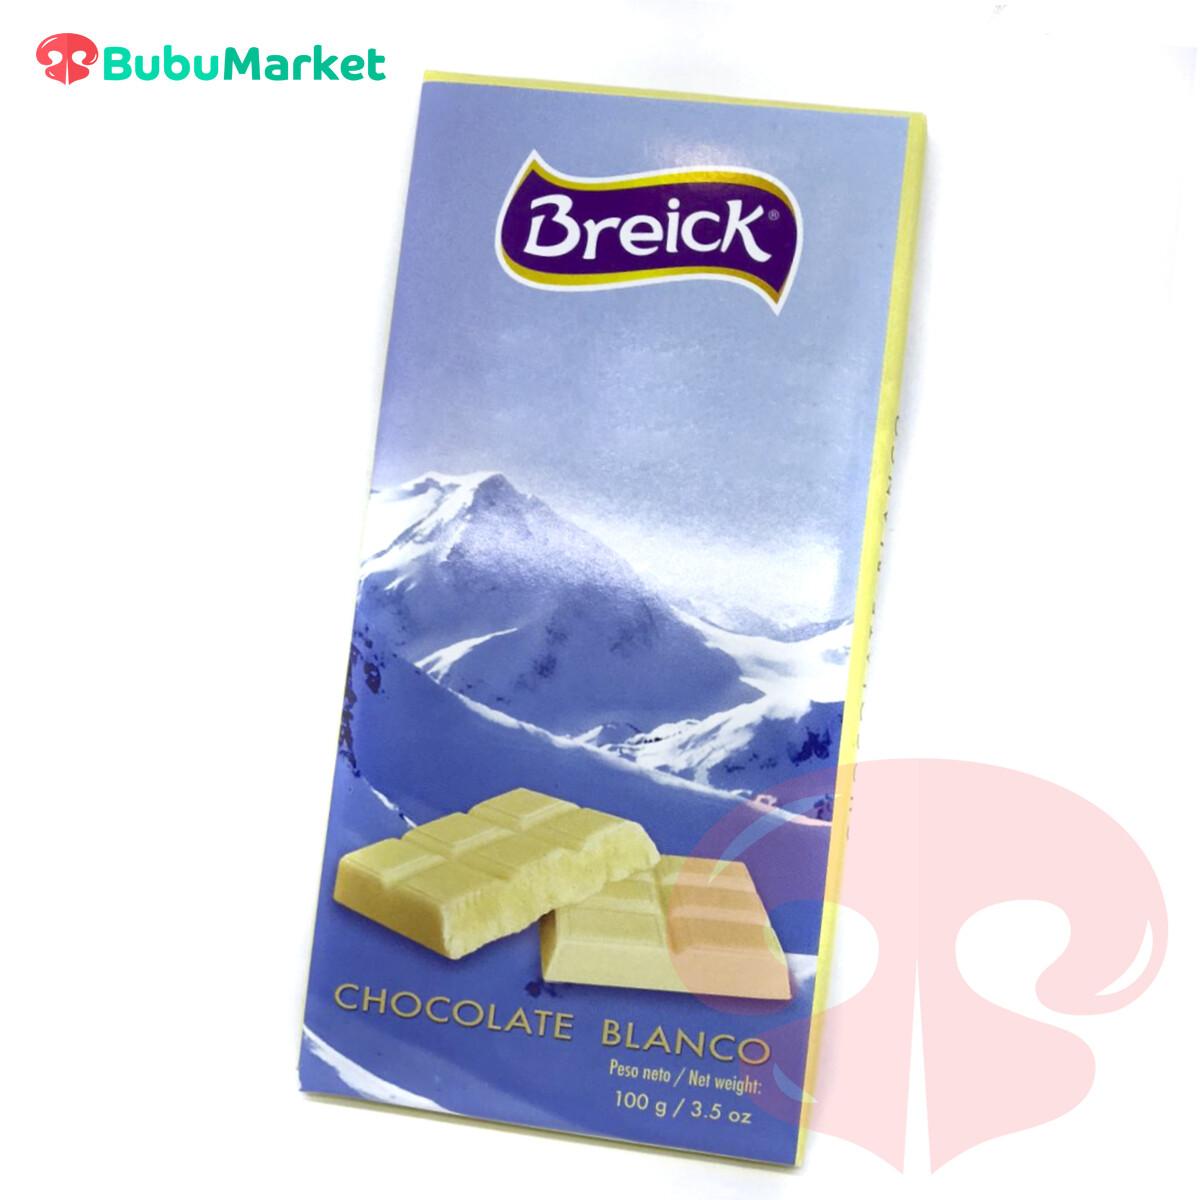 CHOCOLATE BLANCO BREICK TABLETA 100 GR.